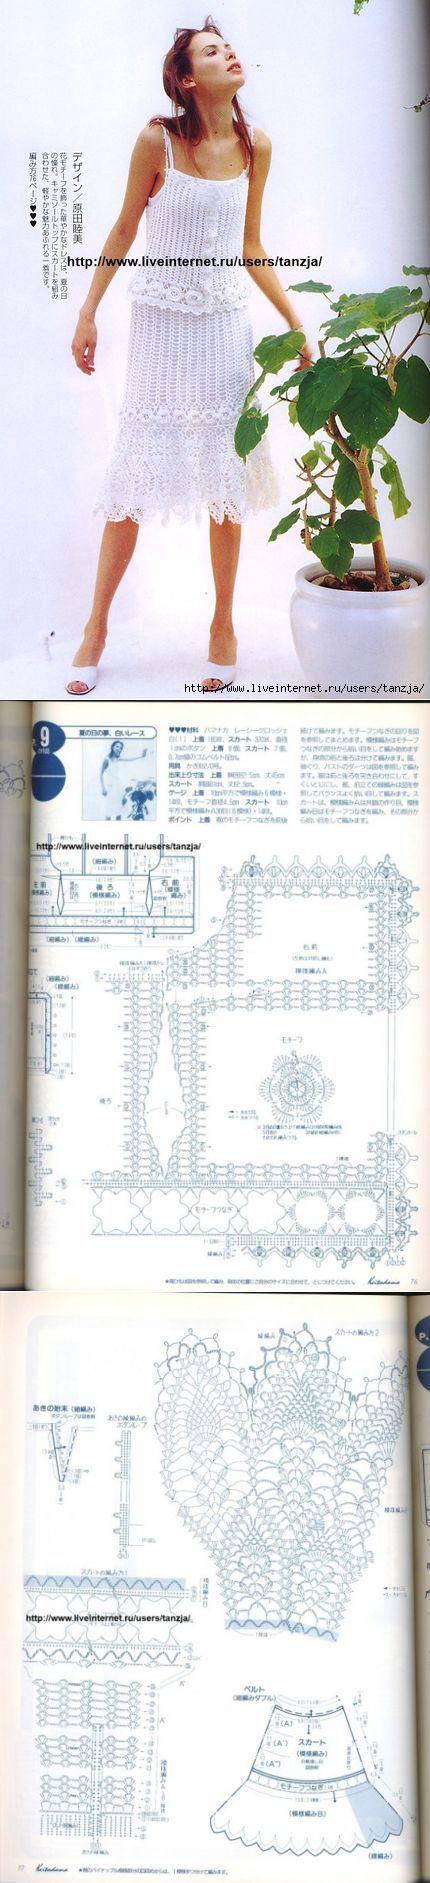 Летний костюм крючком - Онлайн-журнал о вязании и кулинарии | вязание | Постила